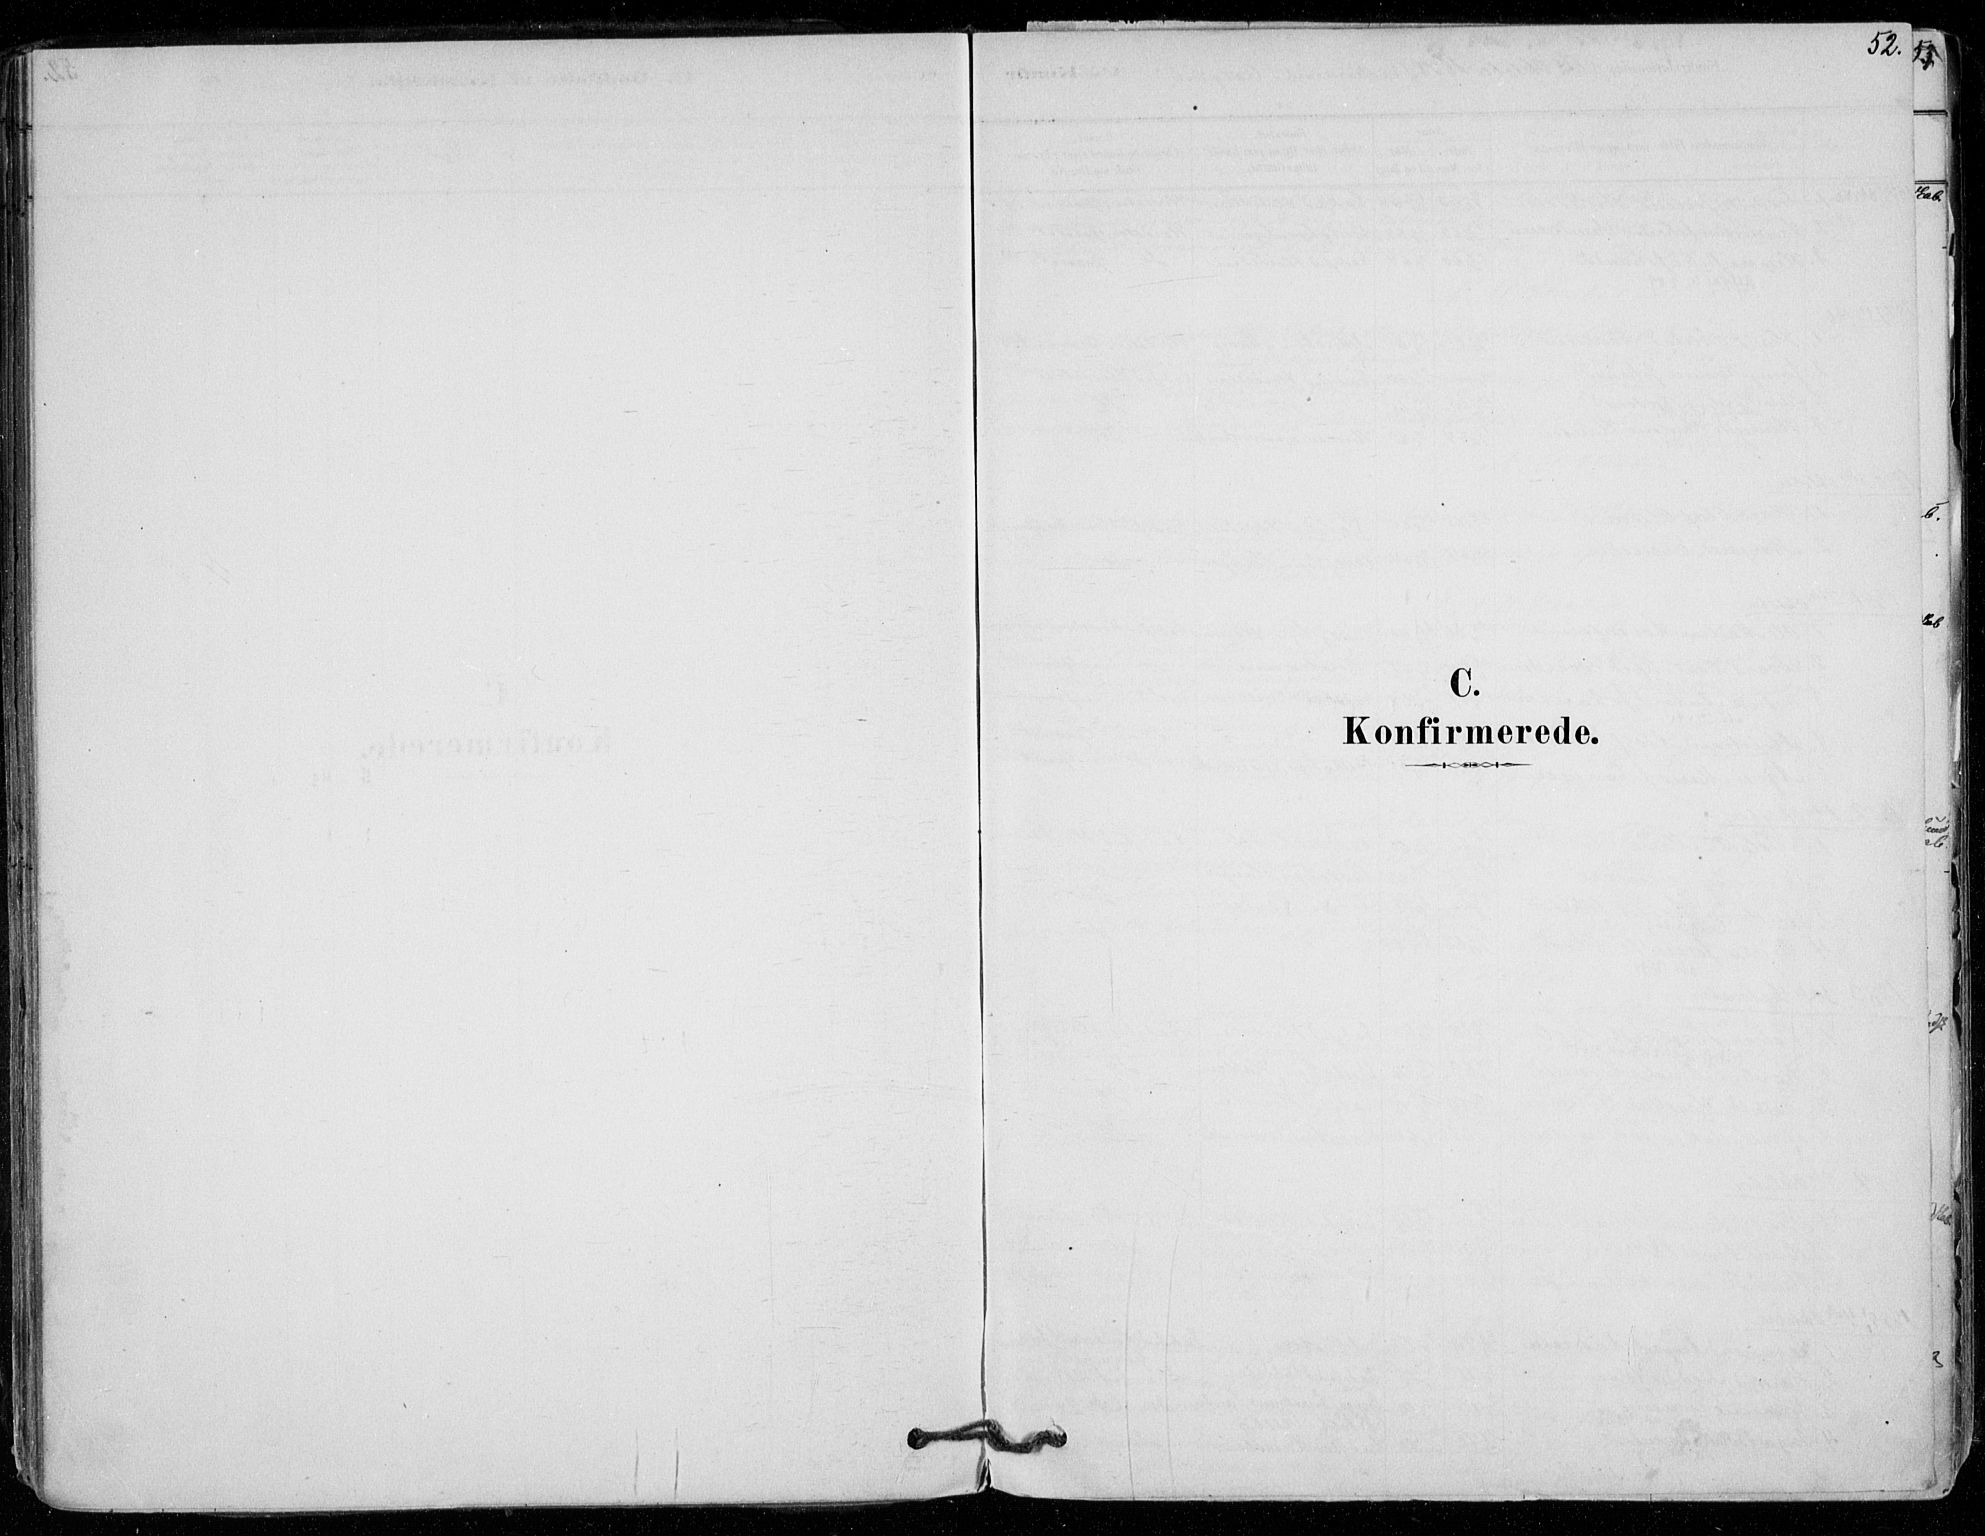 SAO, Vestby prestekontor Kirkebøker, F/Fd/L0001: Ministerialbok nr. IV 1, 1878-1945, s. 52